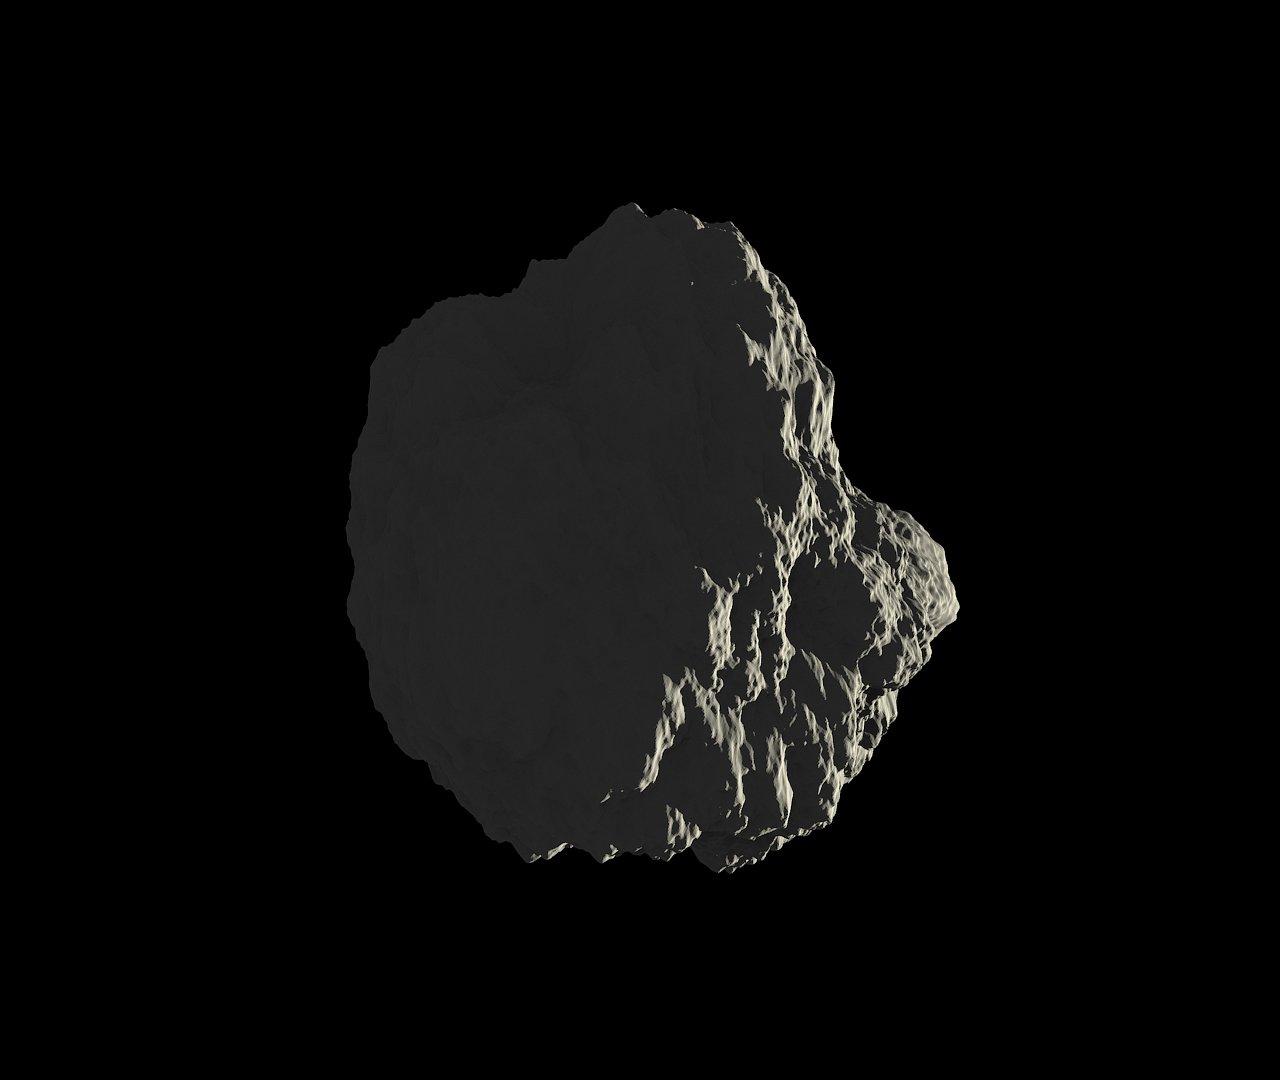 asteroid printable pattern - photo #40